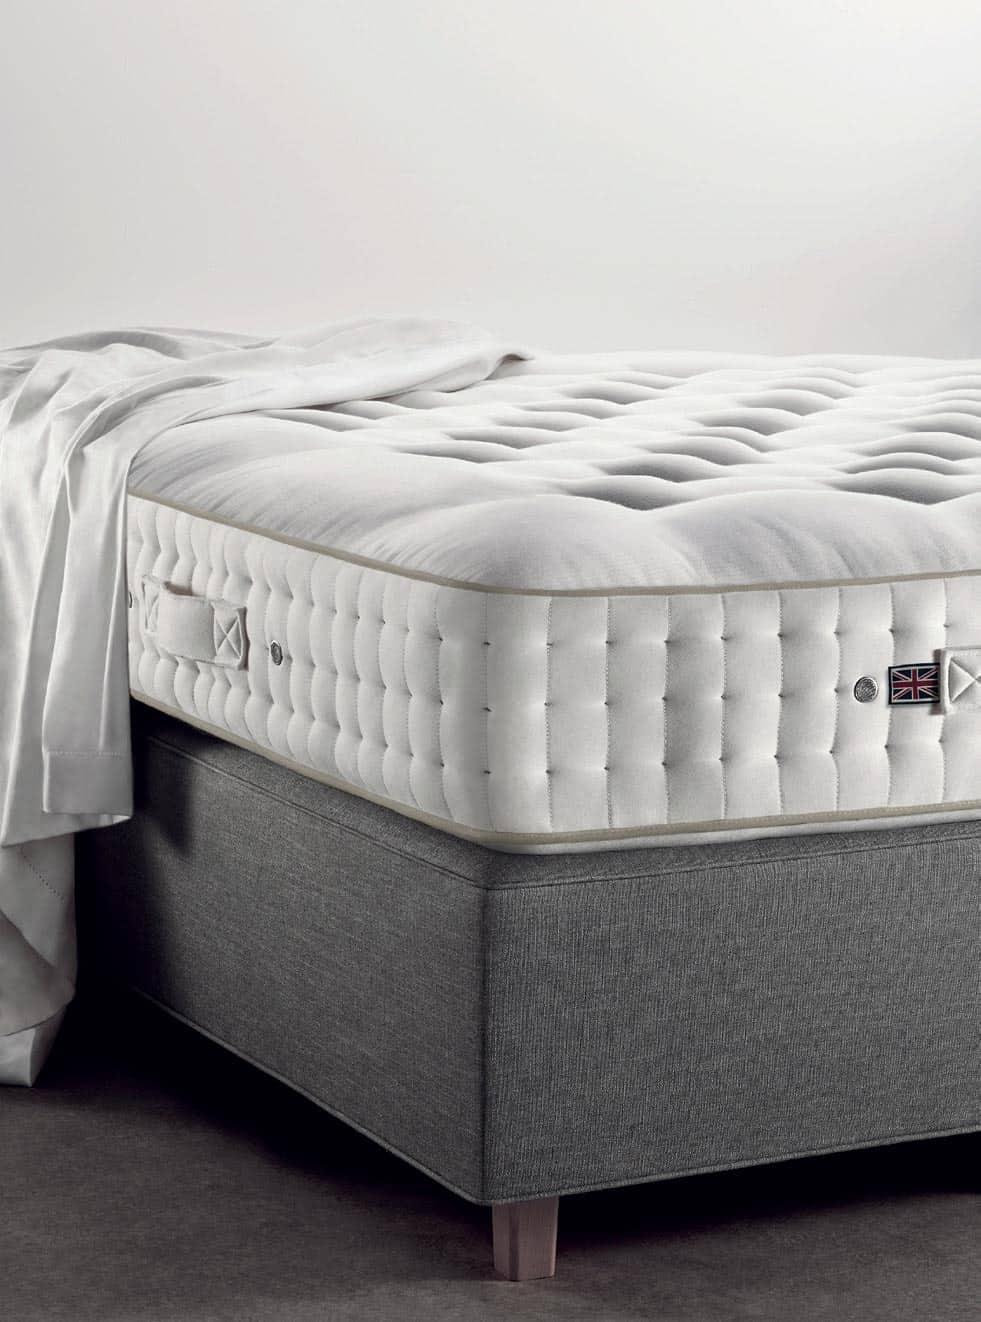 Vispring Tiara Superb mattress and Sovereign divan corner